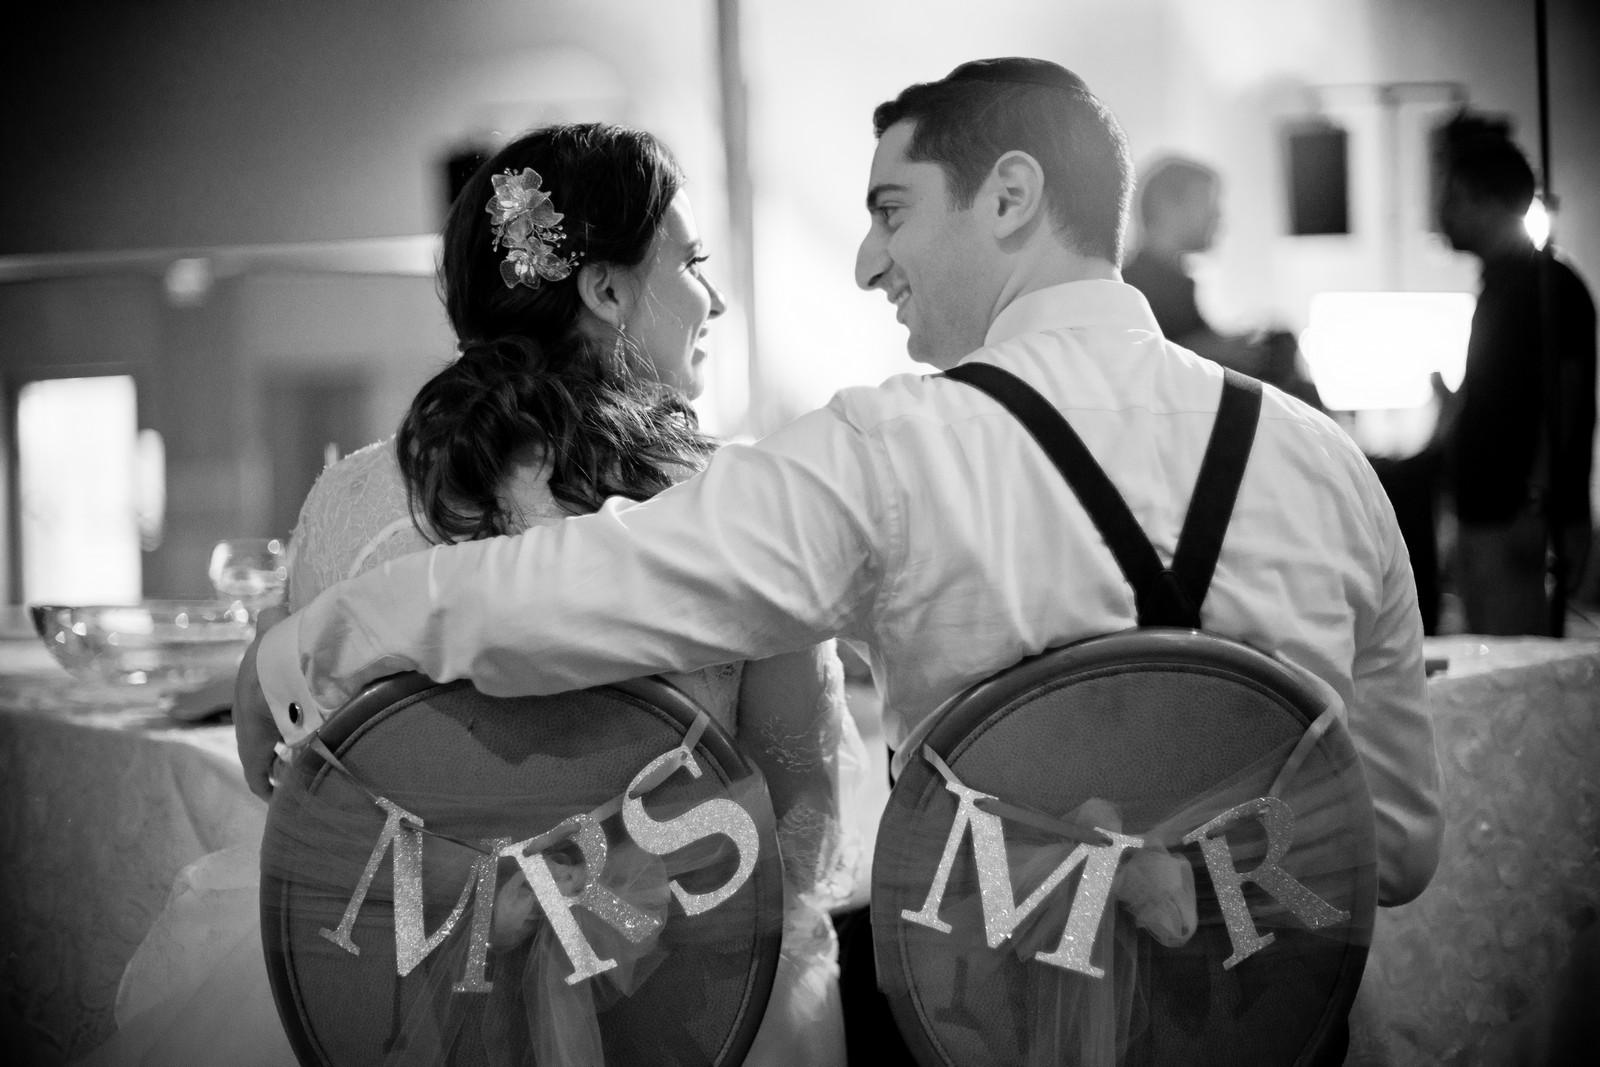 Josh and Michelle's Modern Jewish Wedding at Congregation Keter Torah, Teaneck, New Jersey Photos by Chaim Schvarcz,Bride, Groom